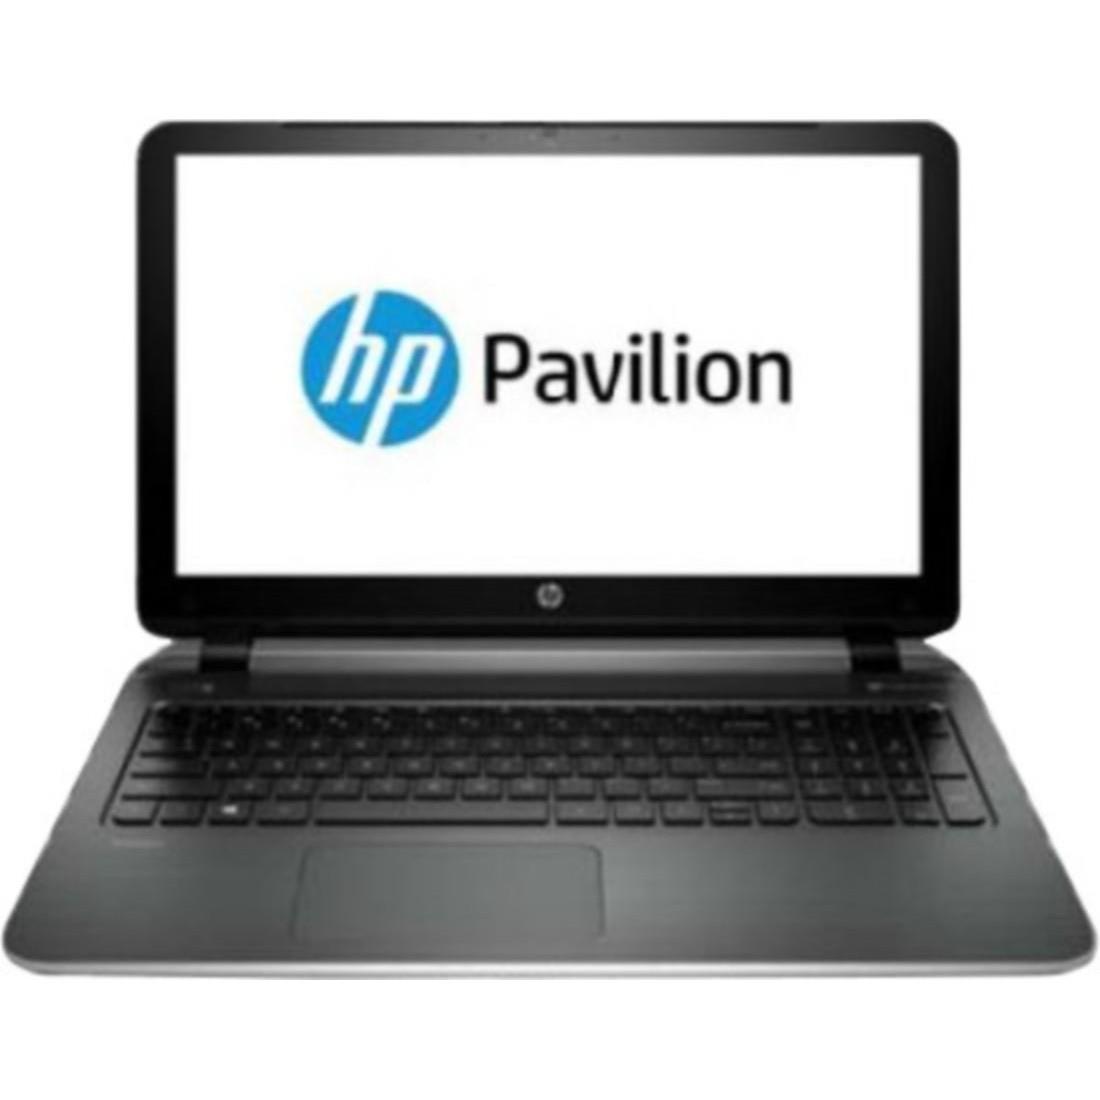 HP Pavilion 15 p210TX Notebook (K8U33PA) Image